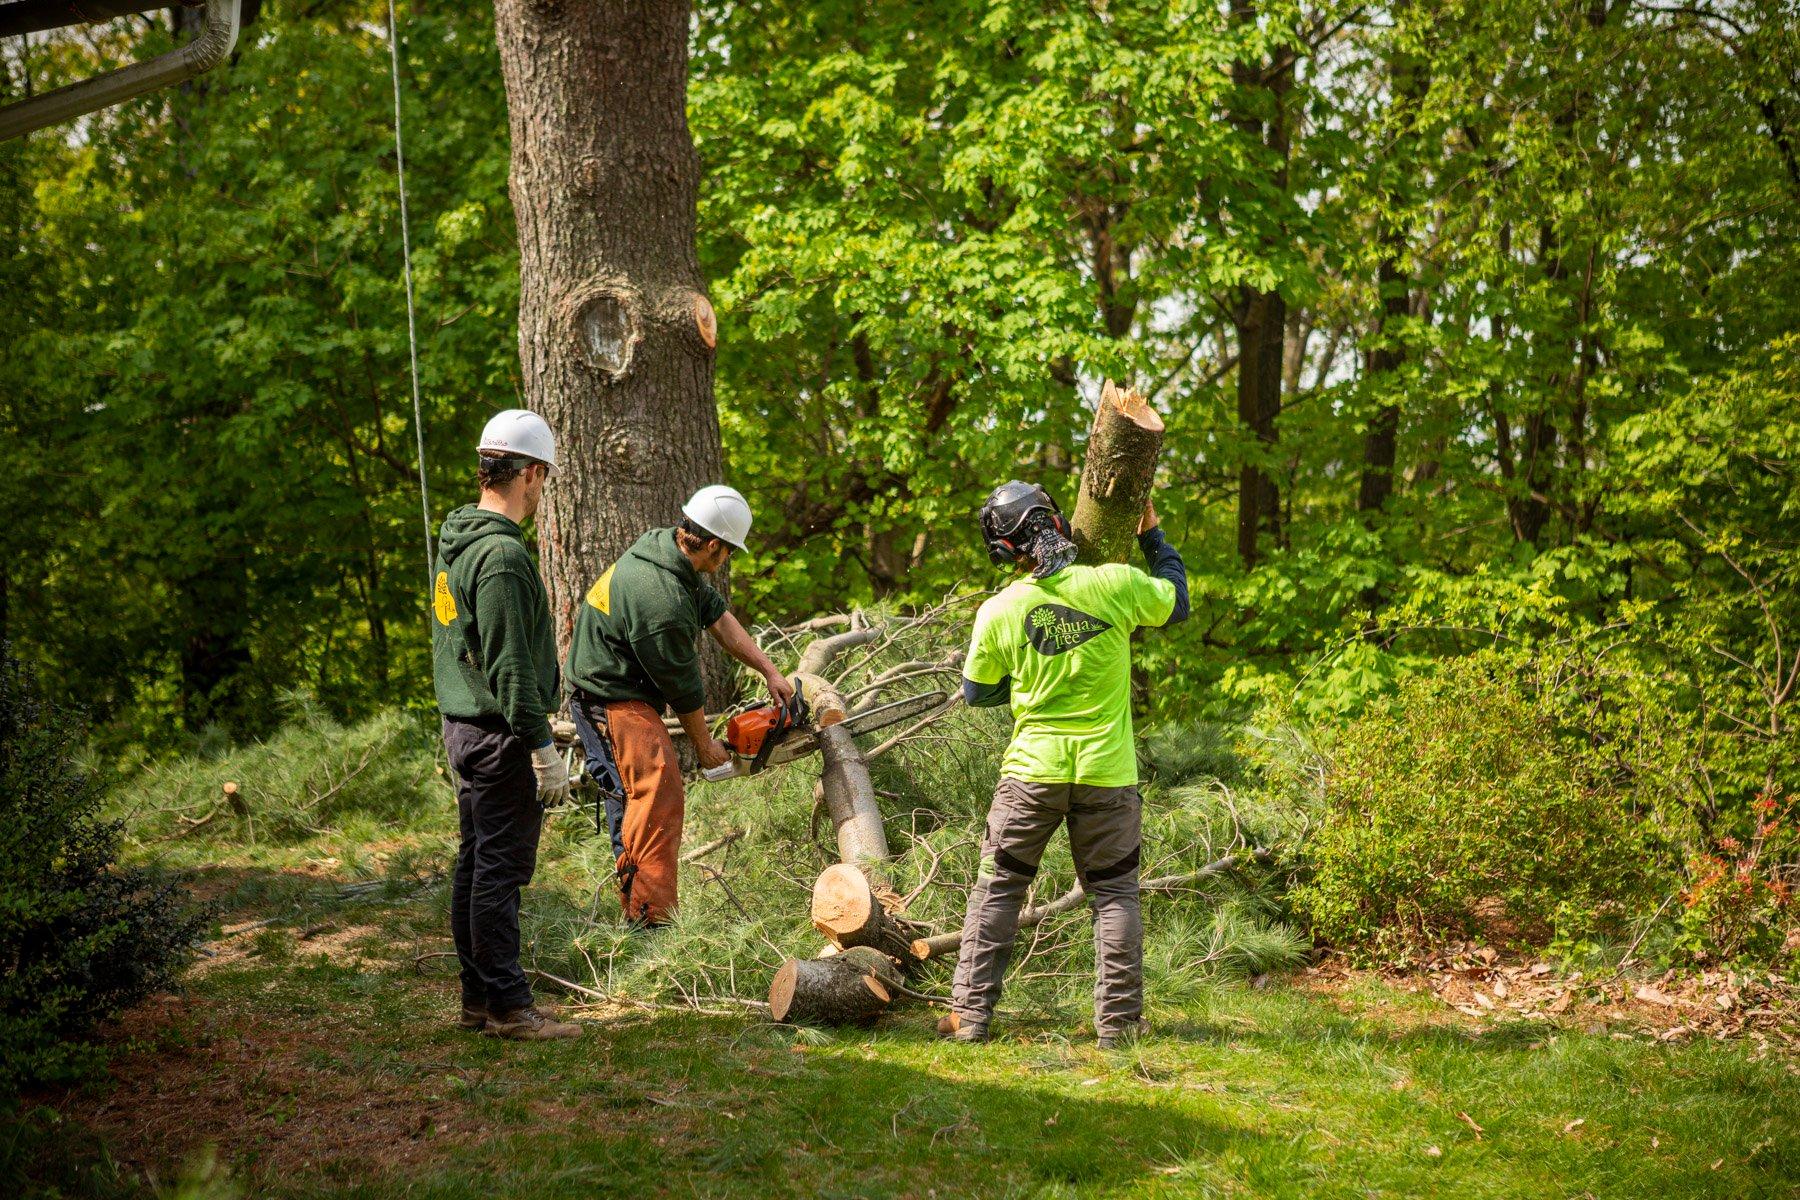 Tree care technicians removing a tree